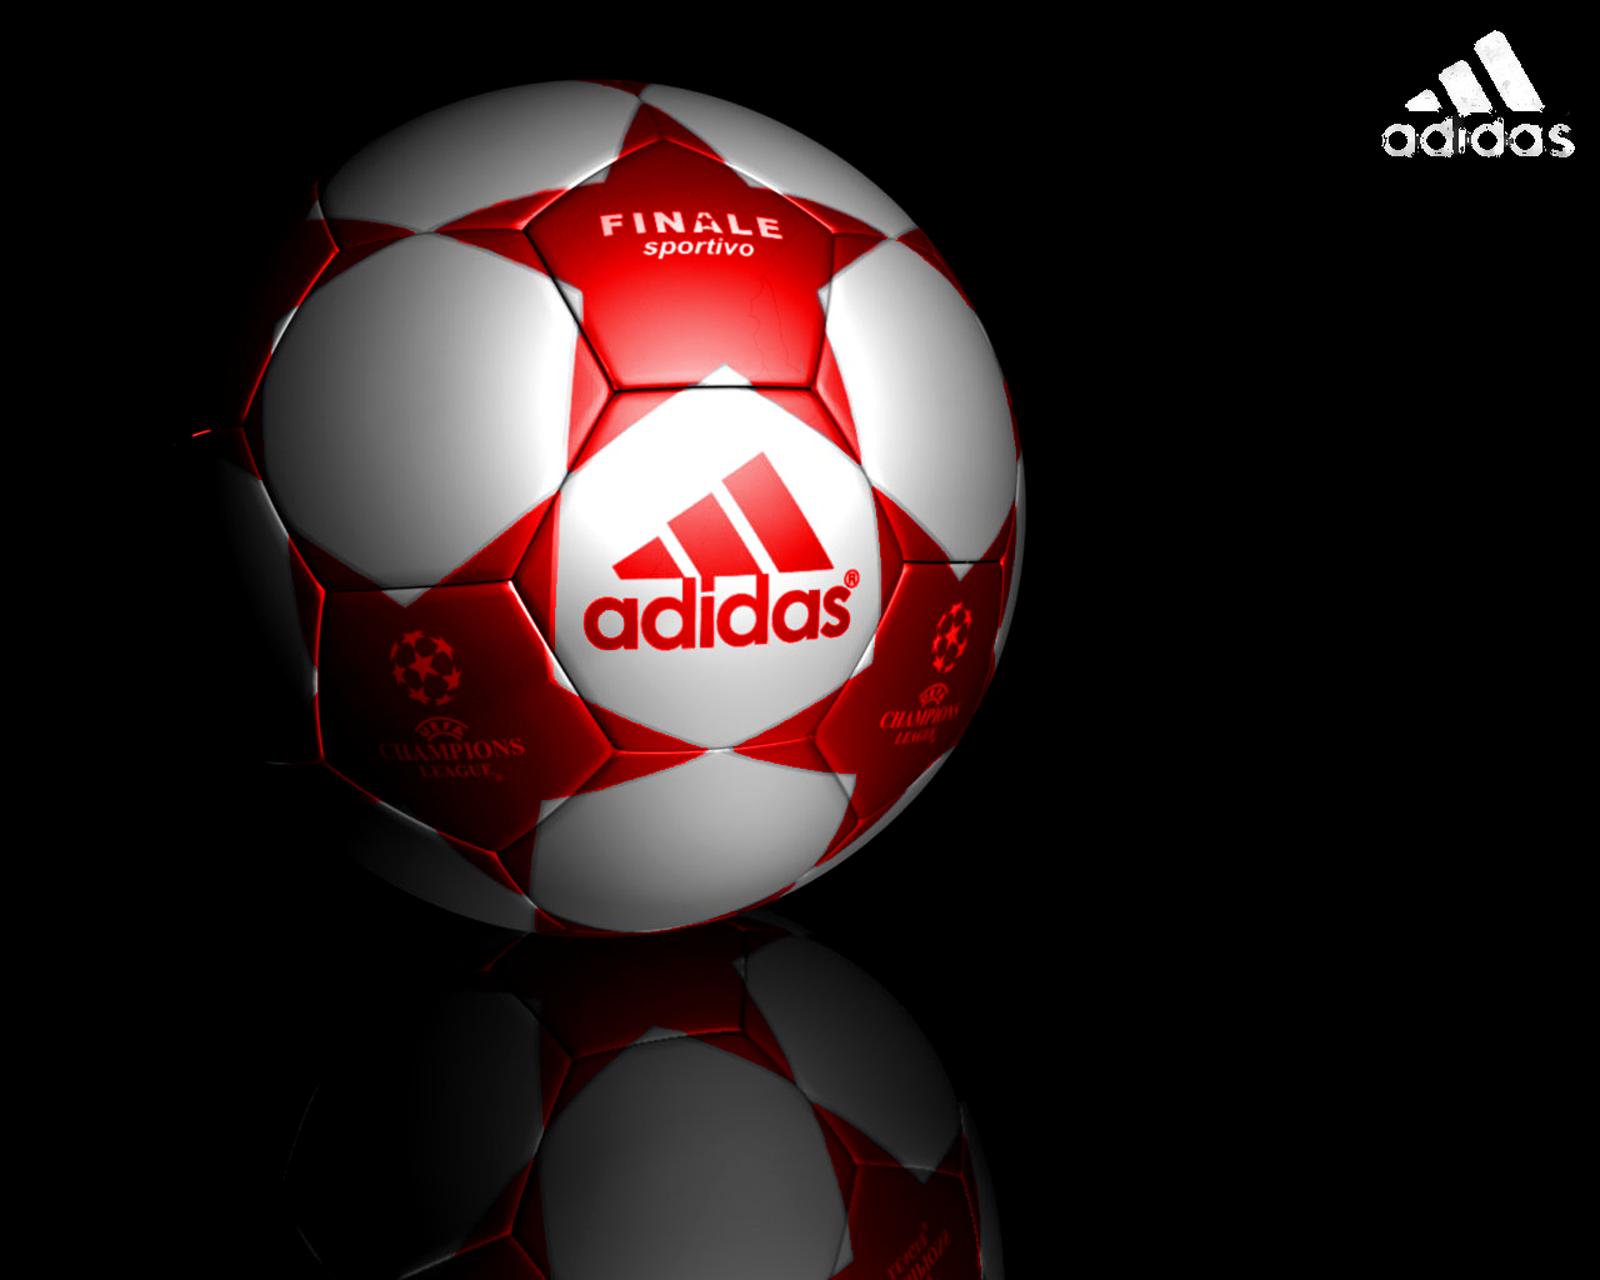 http://1.bp.blogspot.com/-vLzl_tZqApM/T50rBrYF1hI/AAAAAAAABdg/YnGQWFeMl4g/s1600/Adidas_Eufa_Champions_League_White_Red_Stars_Ball_HD_Wallpaper-Vvallpaper.Net.png